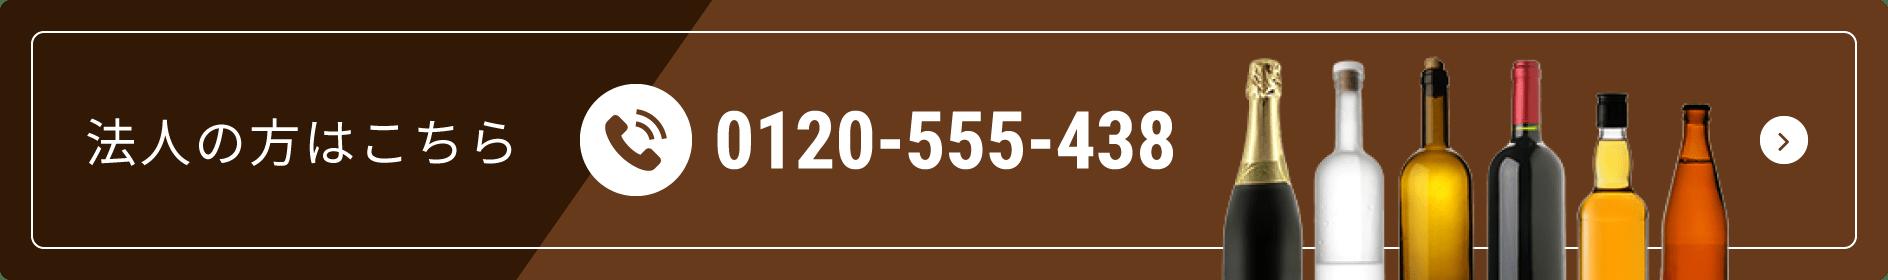 0120-555-438